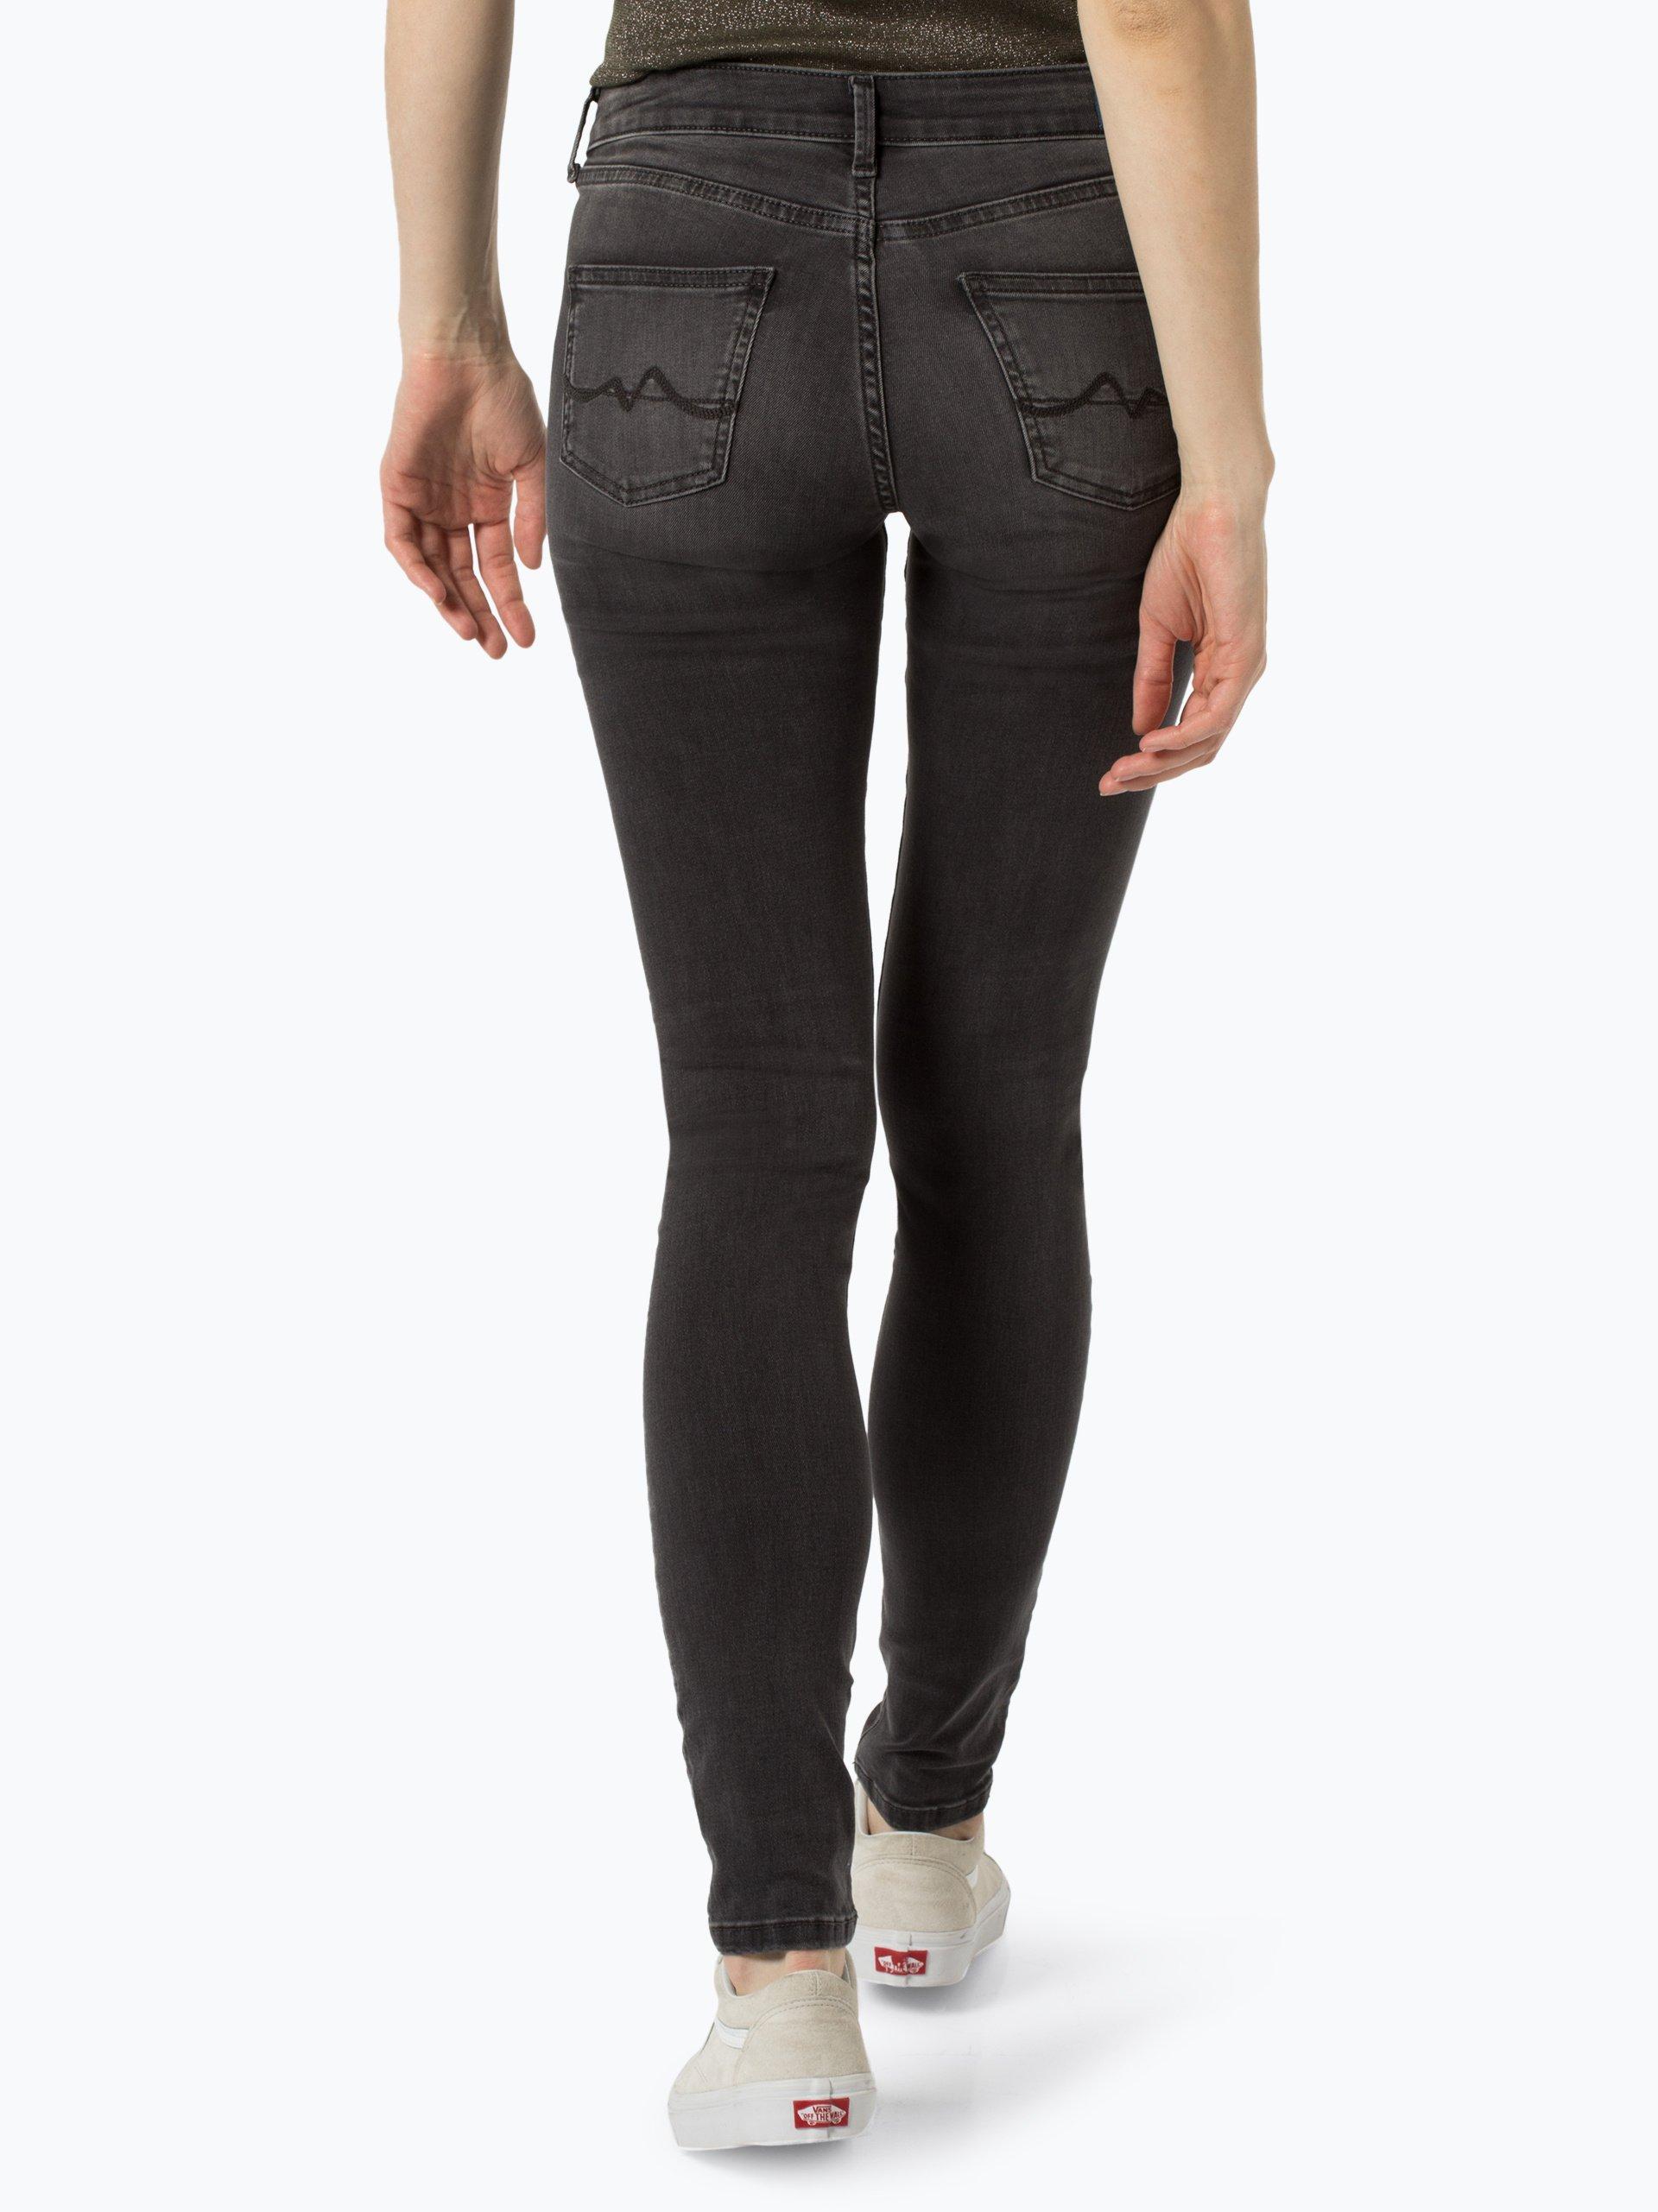 Pepe Jeans Damen Jeans - Pixie